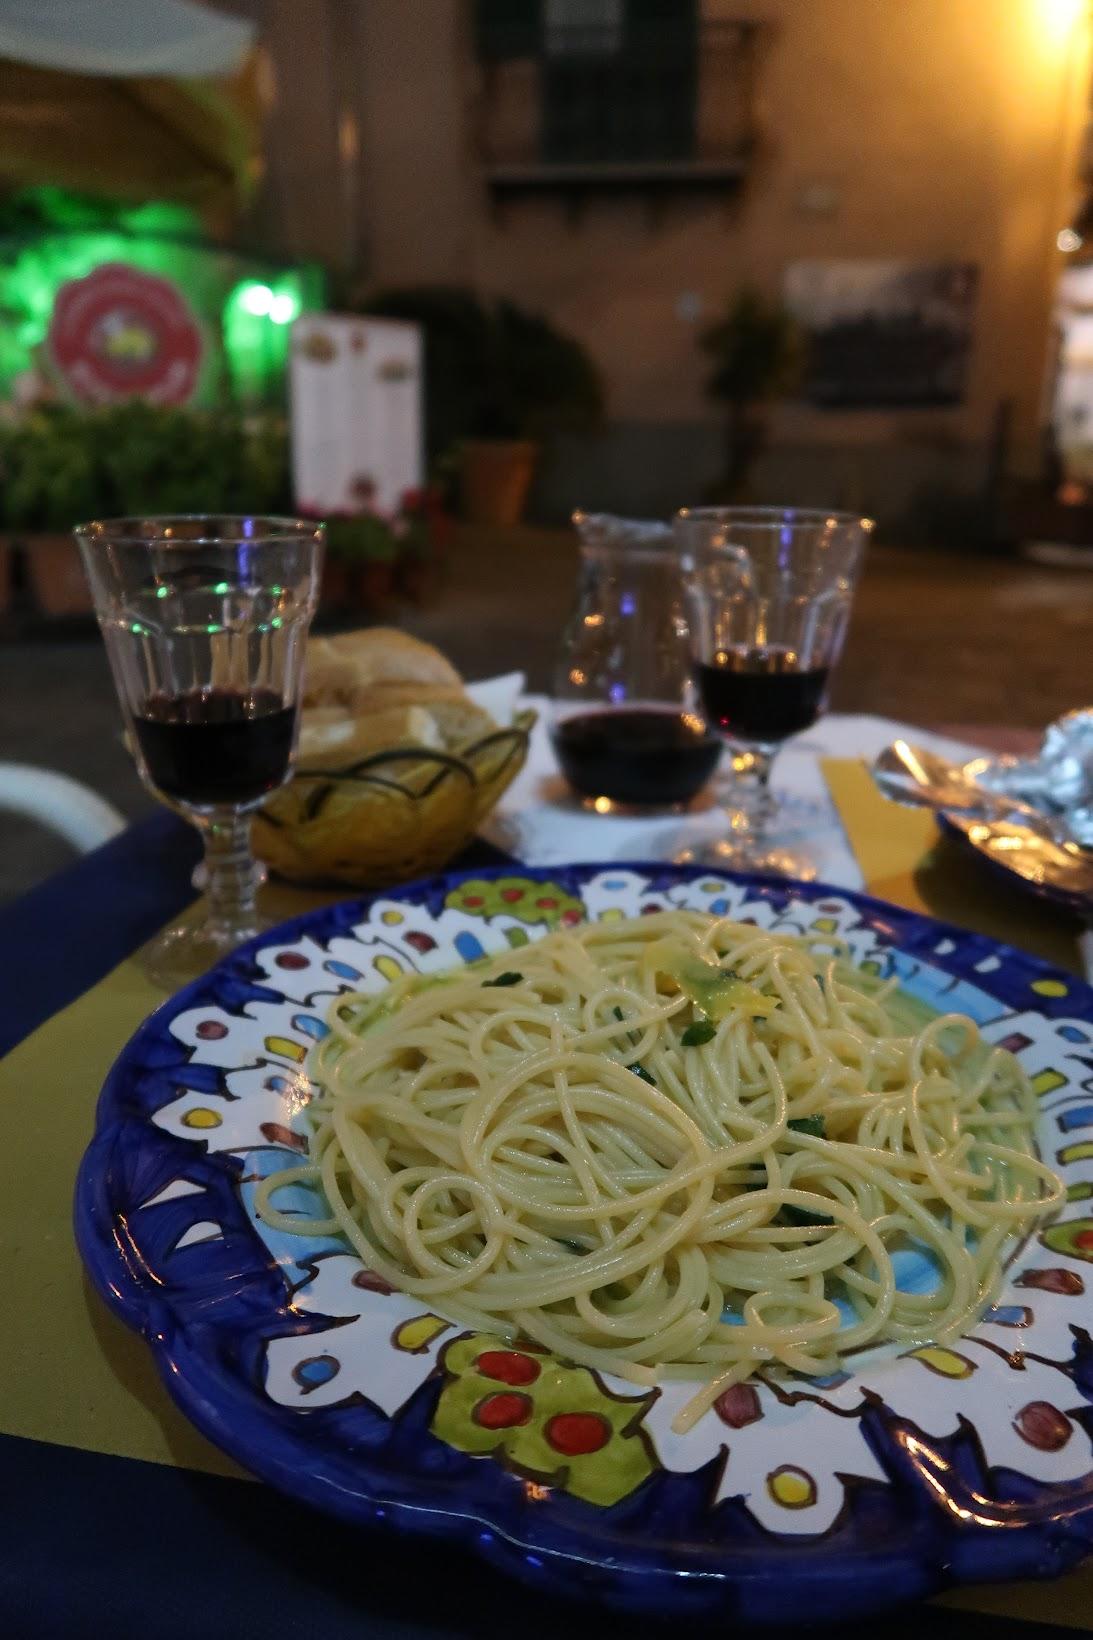 Travel guide to Minori and the Amalfi coast, Minori Italy, what to wear in Minori Italy, what to eat in Minori Italy, Traveling to italy this summer